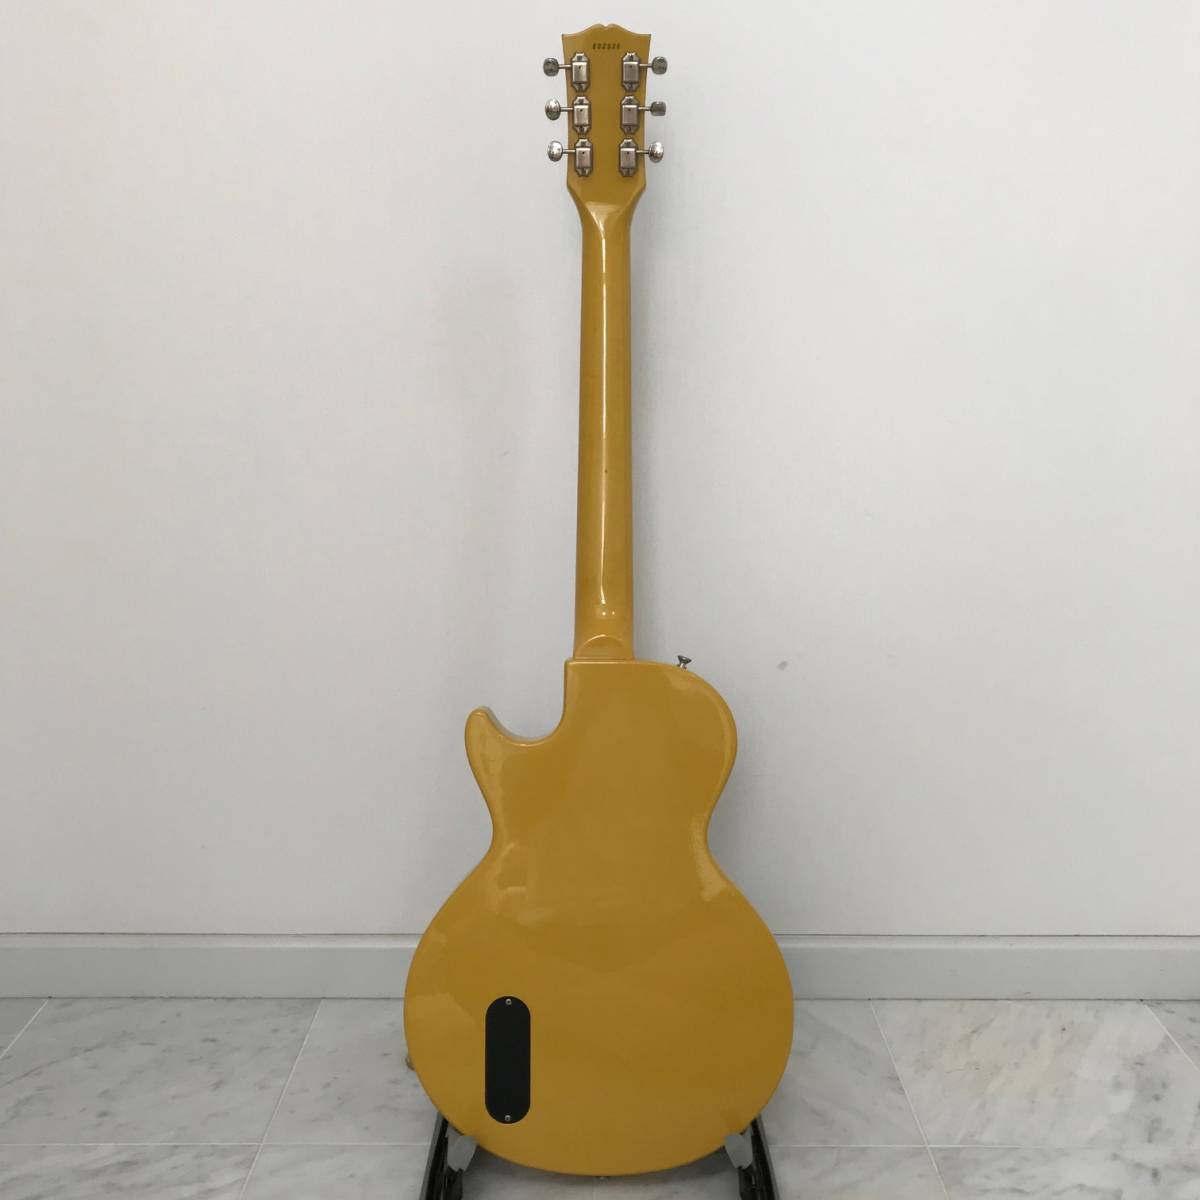 Orville by Gibson Les Paul Junior オービル バイ ギブソン レスポールジュニア イエロー 重量3.6kg_画像6